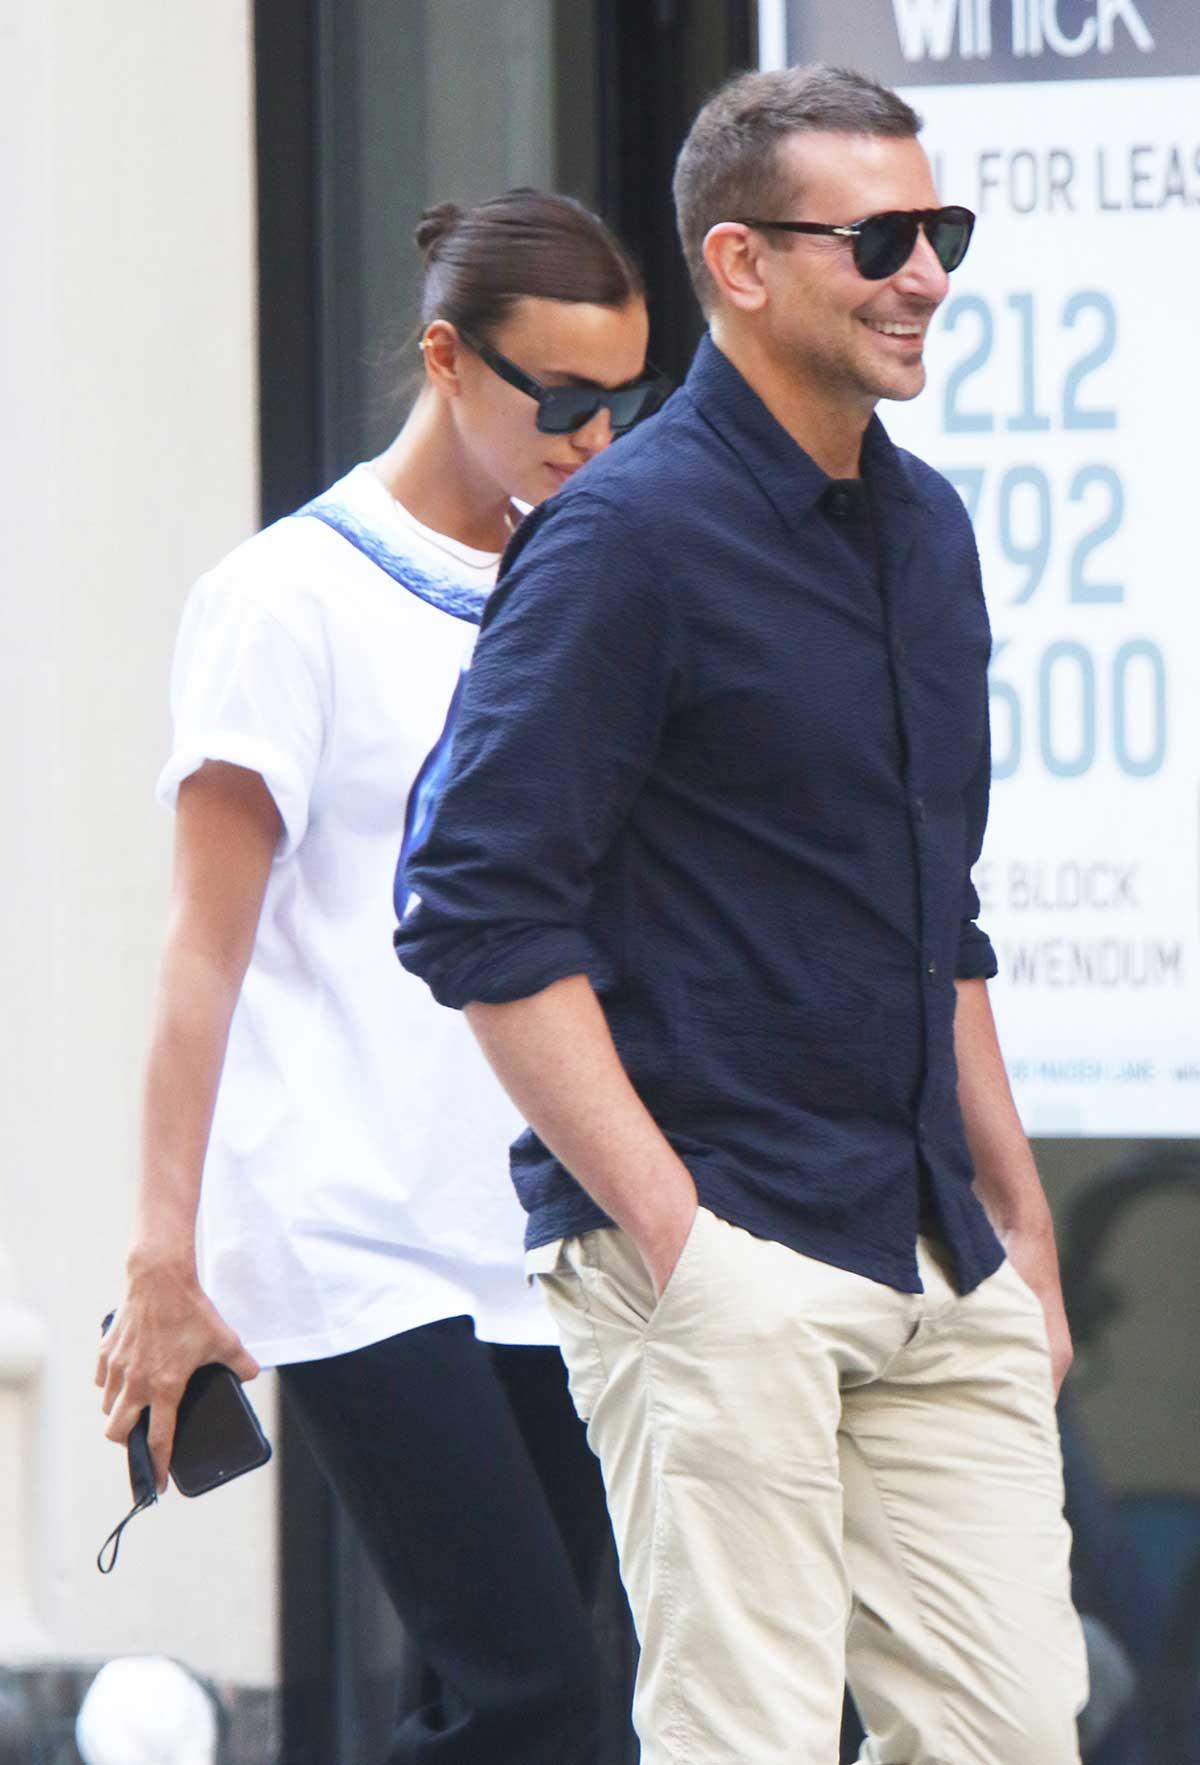 Irina Shayk se deja ver con Bradley Cooper tras rumores de romance con Kanye West